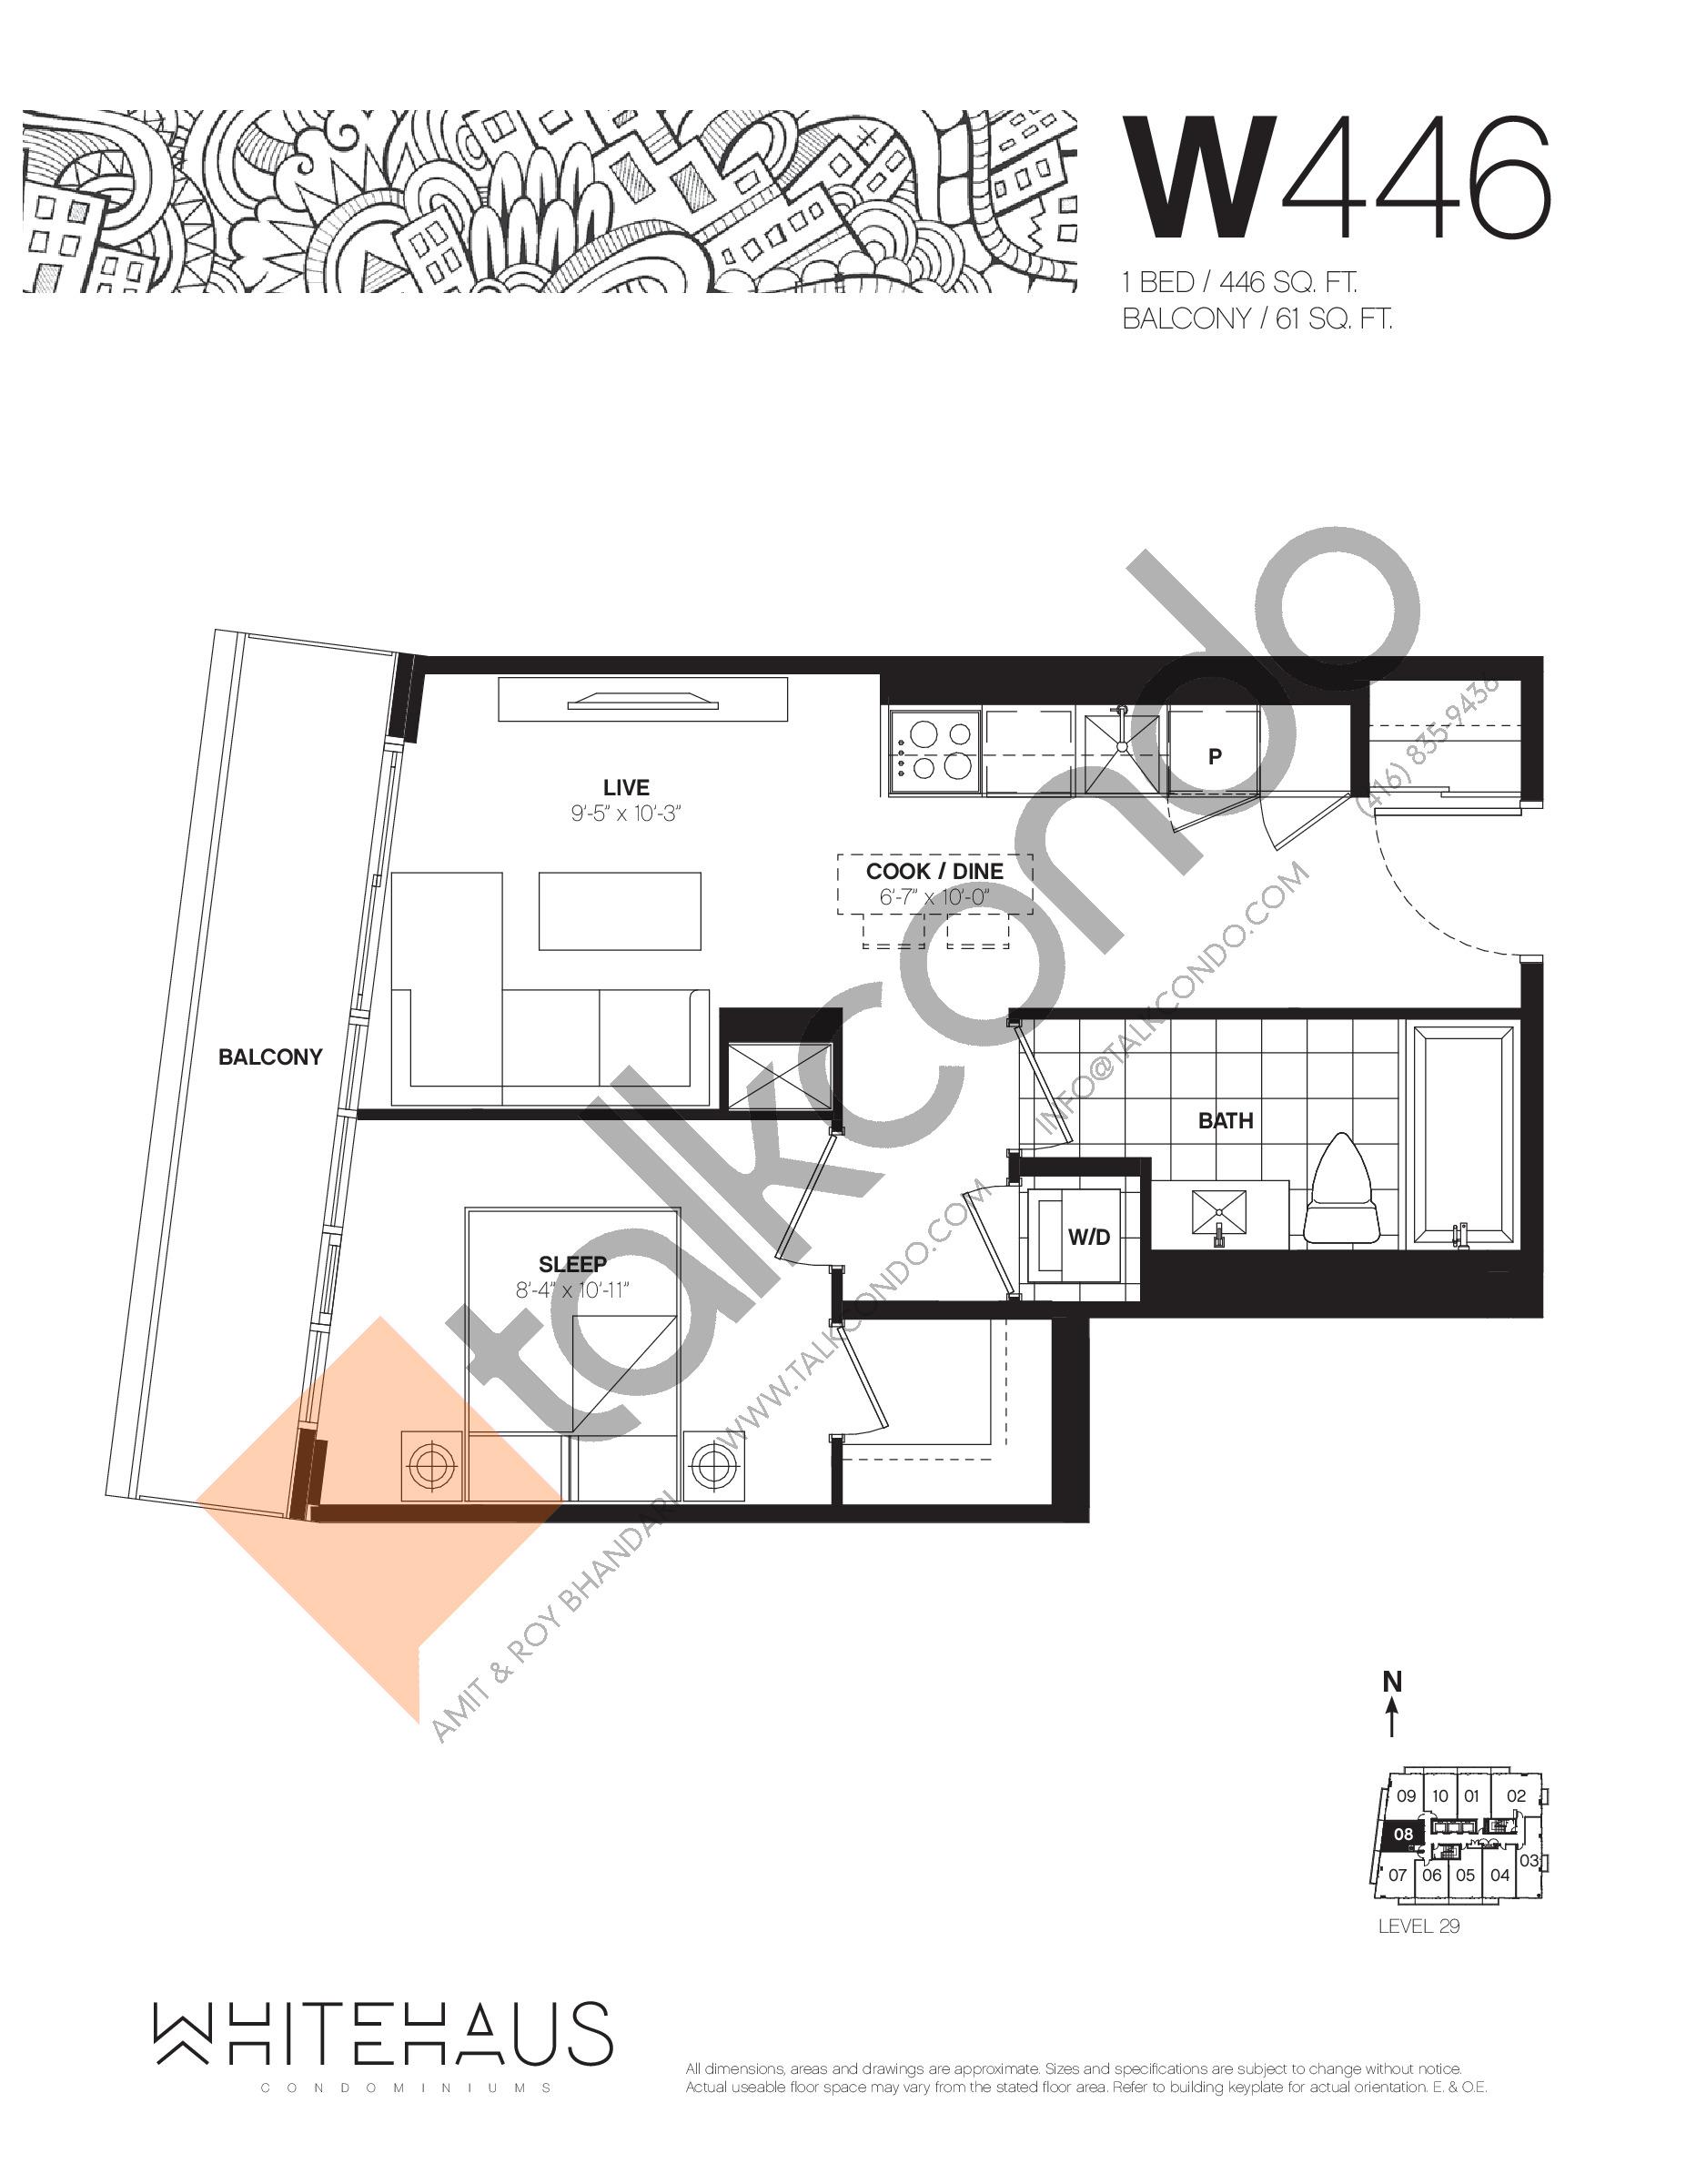 W446 Floor Plan at Whitehaus Condos - 446 sq.ft